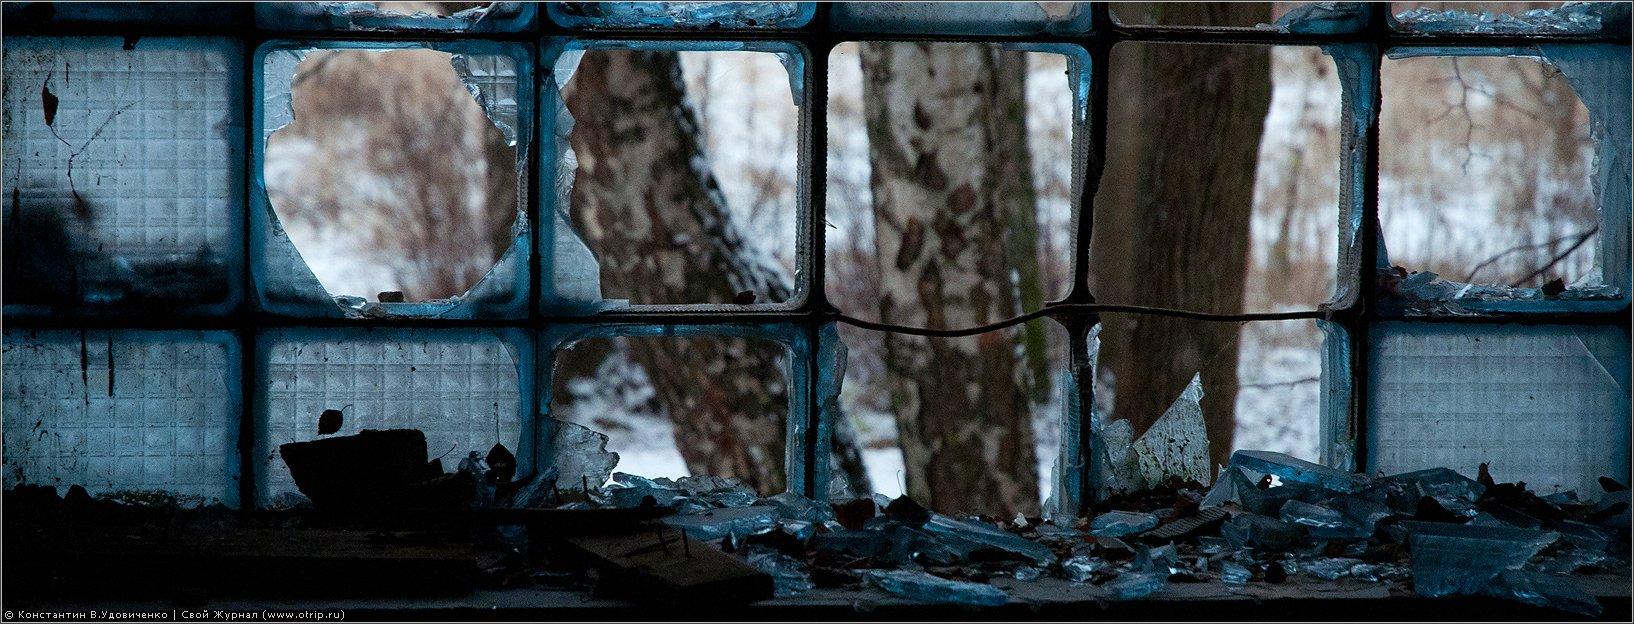 8077s_2.jpg - Заброшенная ВЧ (10.12.2011)